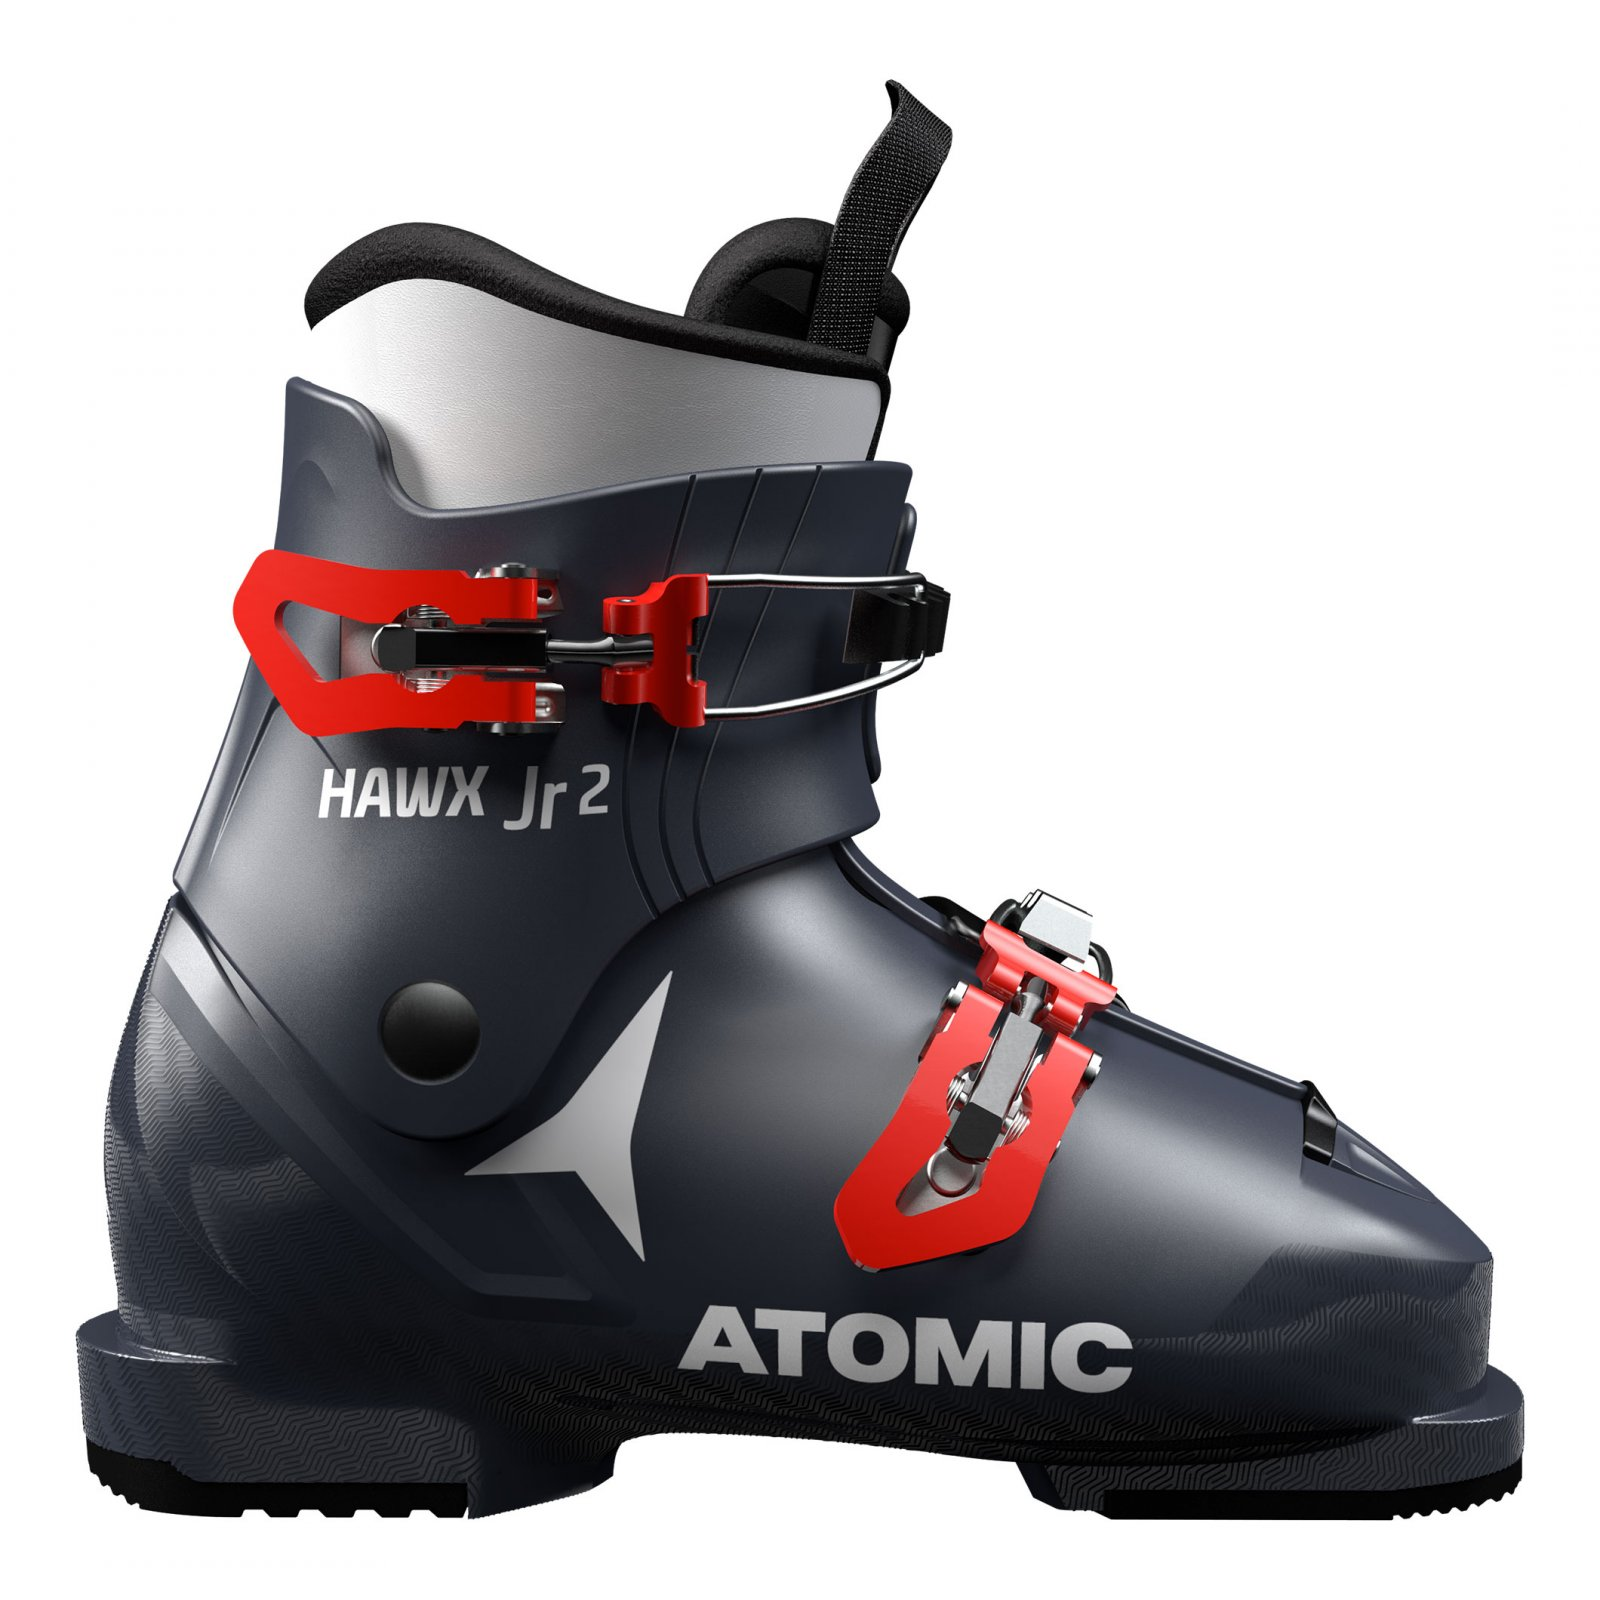 c68be698e3b6 Sjezdové boty Atomic Hawx JR 2 Dark Blue Red AE5018820 18 19 ...